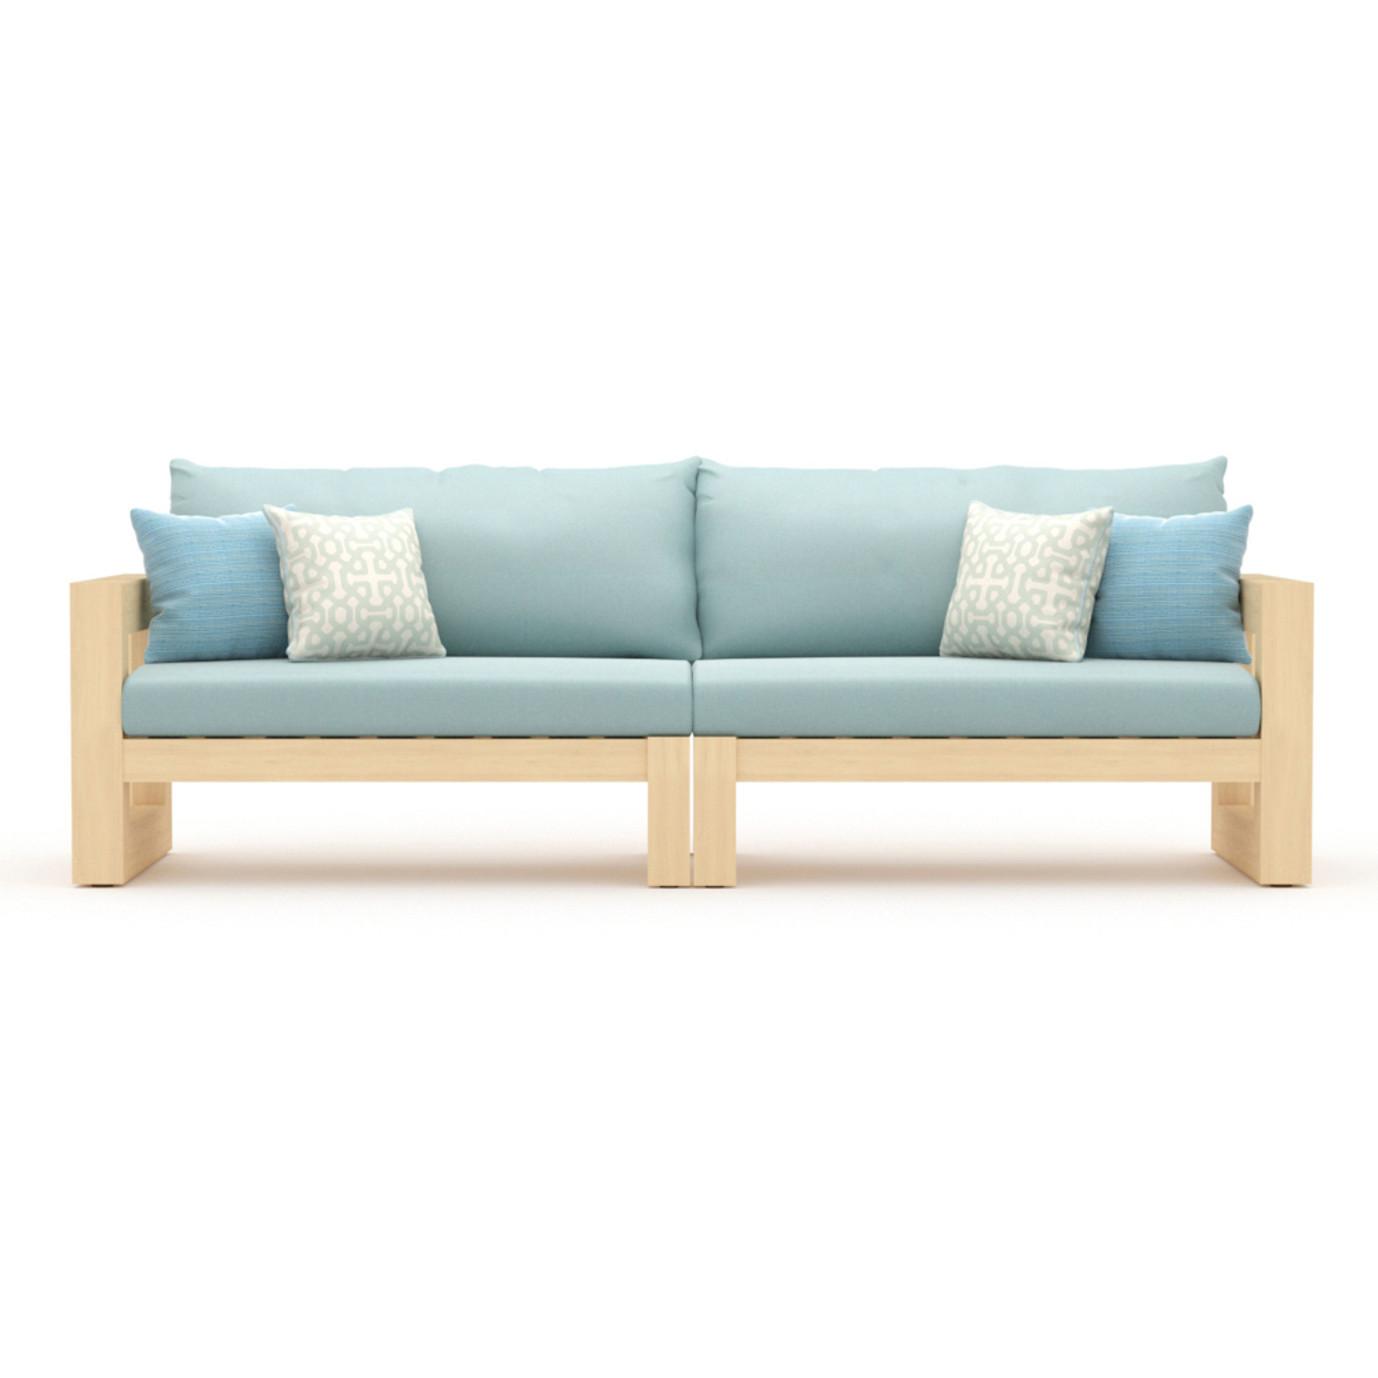 Benson 96in Sofa - Spa Blue